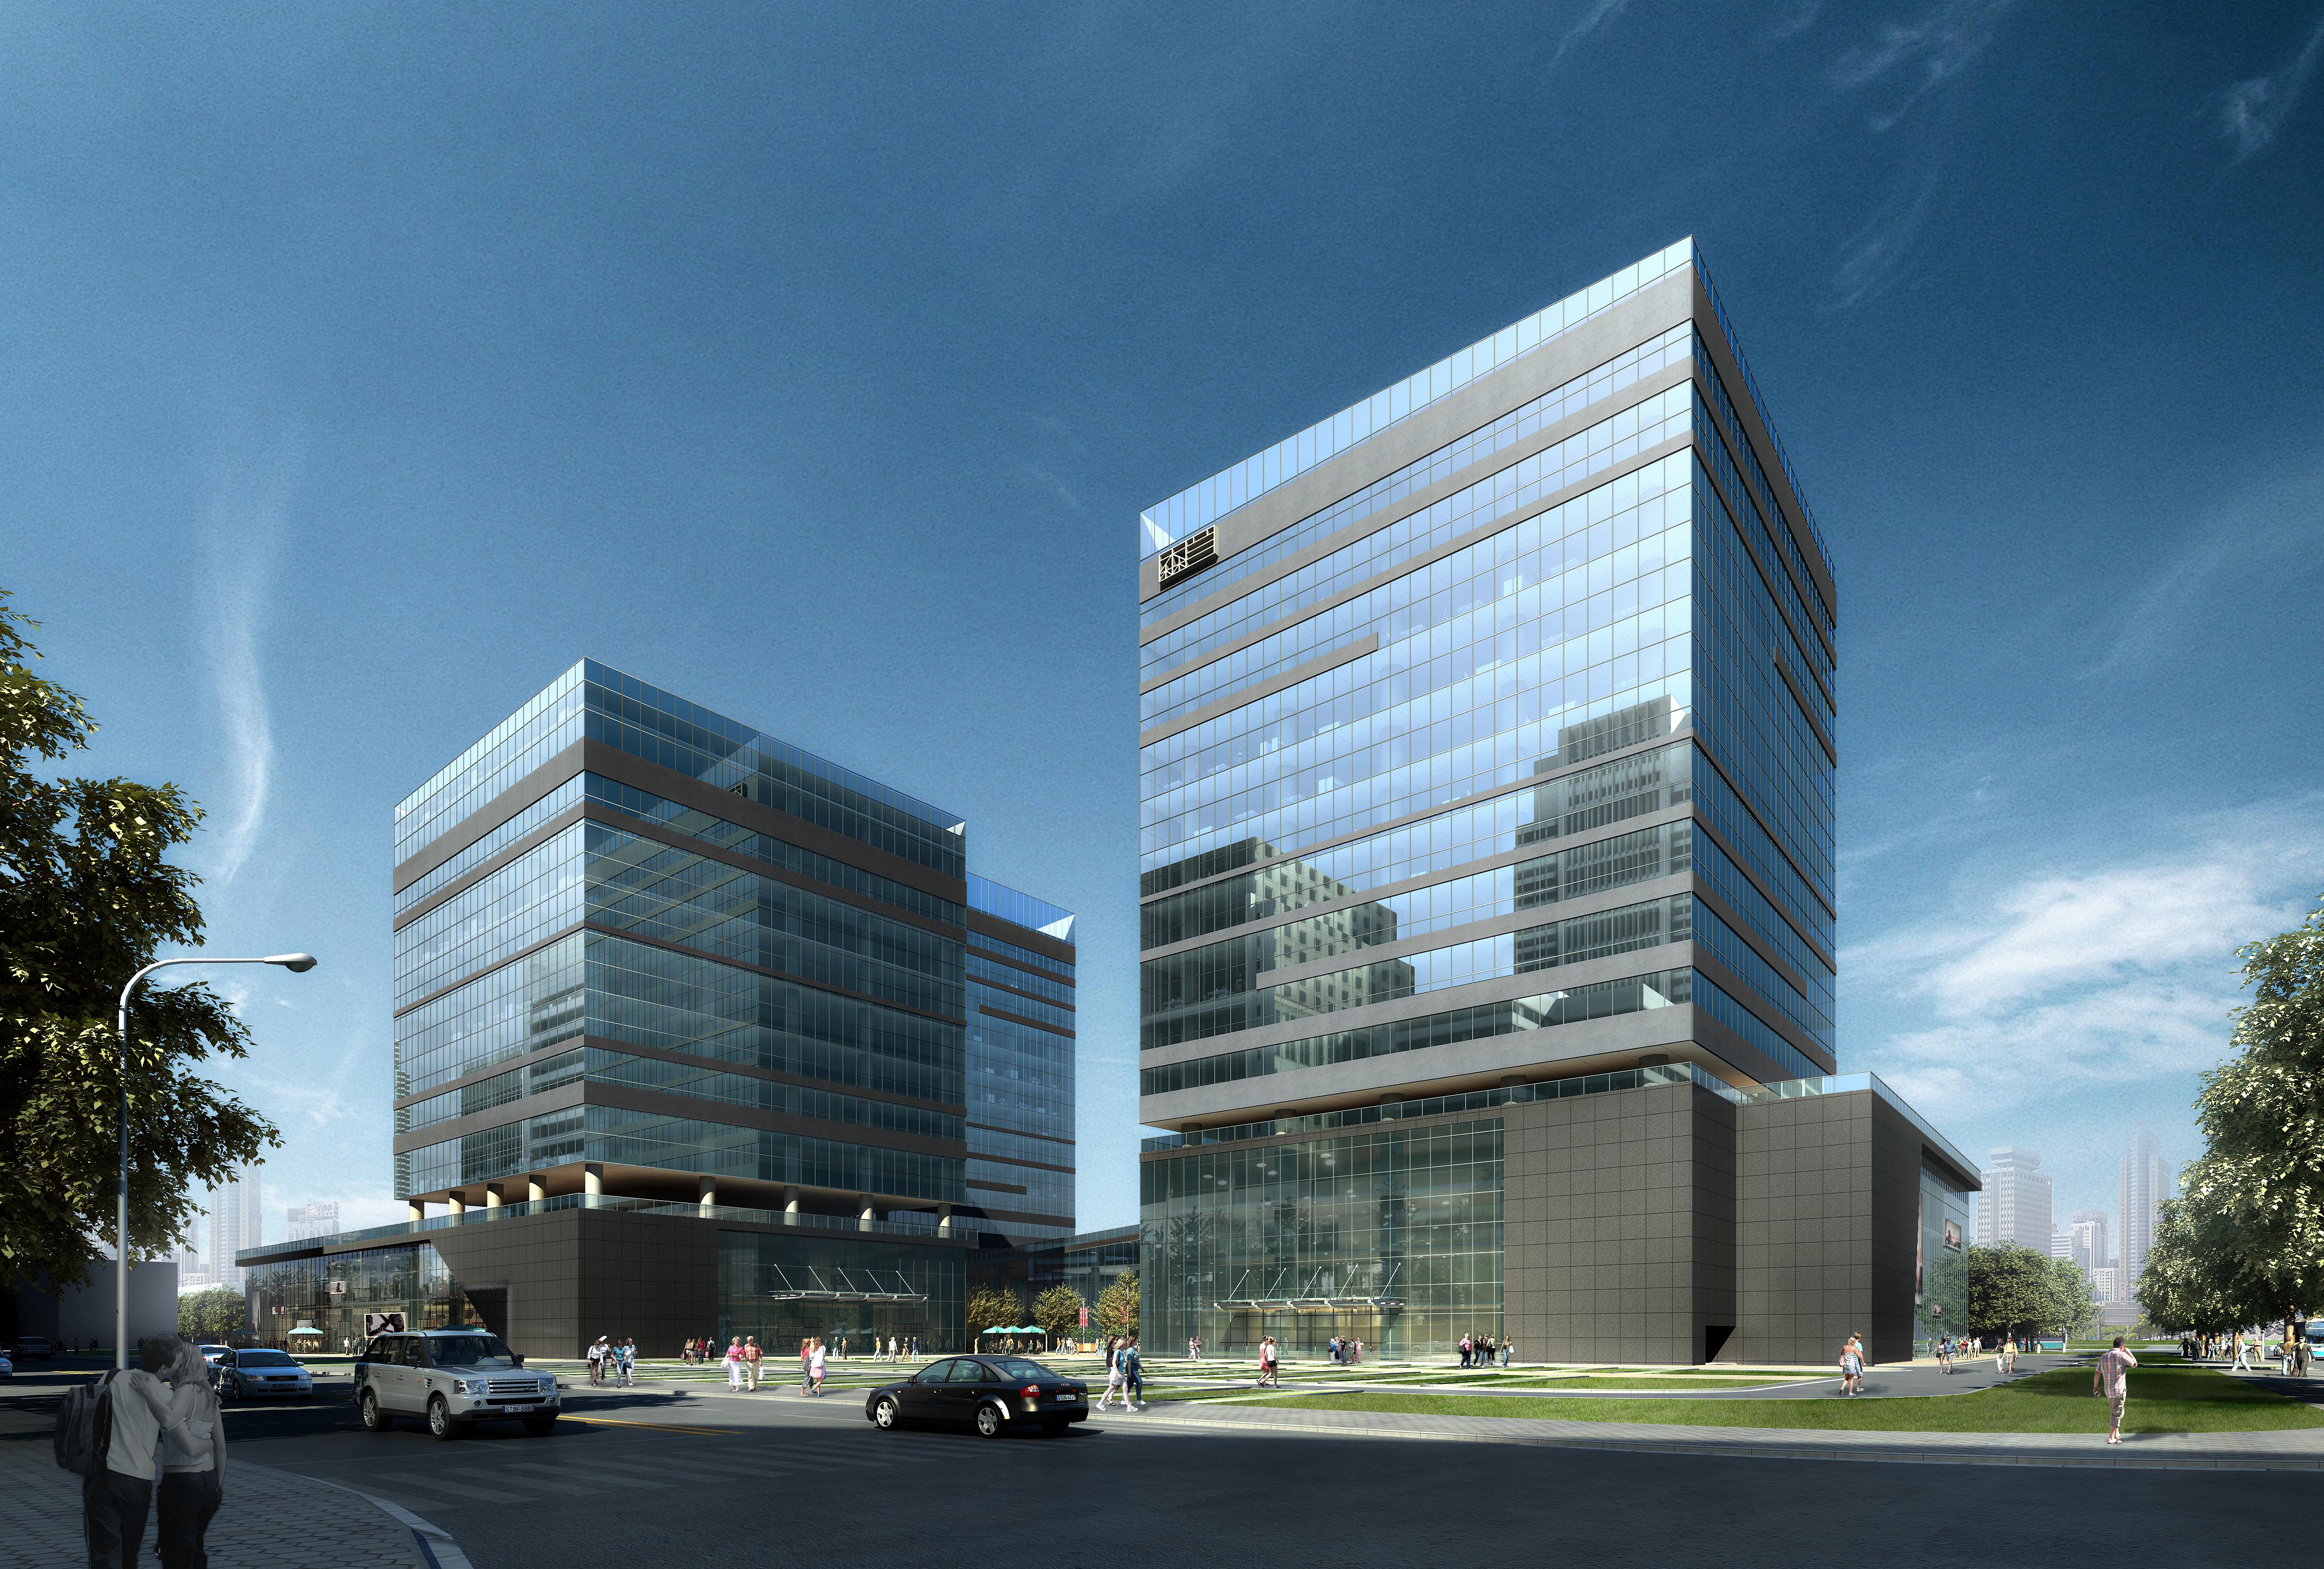 Building Exterior: Skyscraper Office Building 029 3D Model